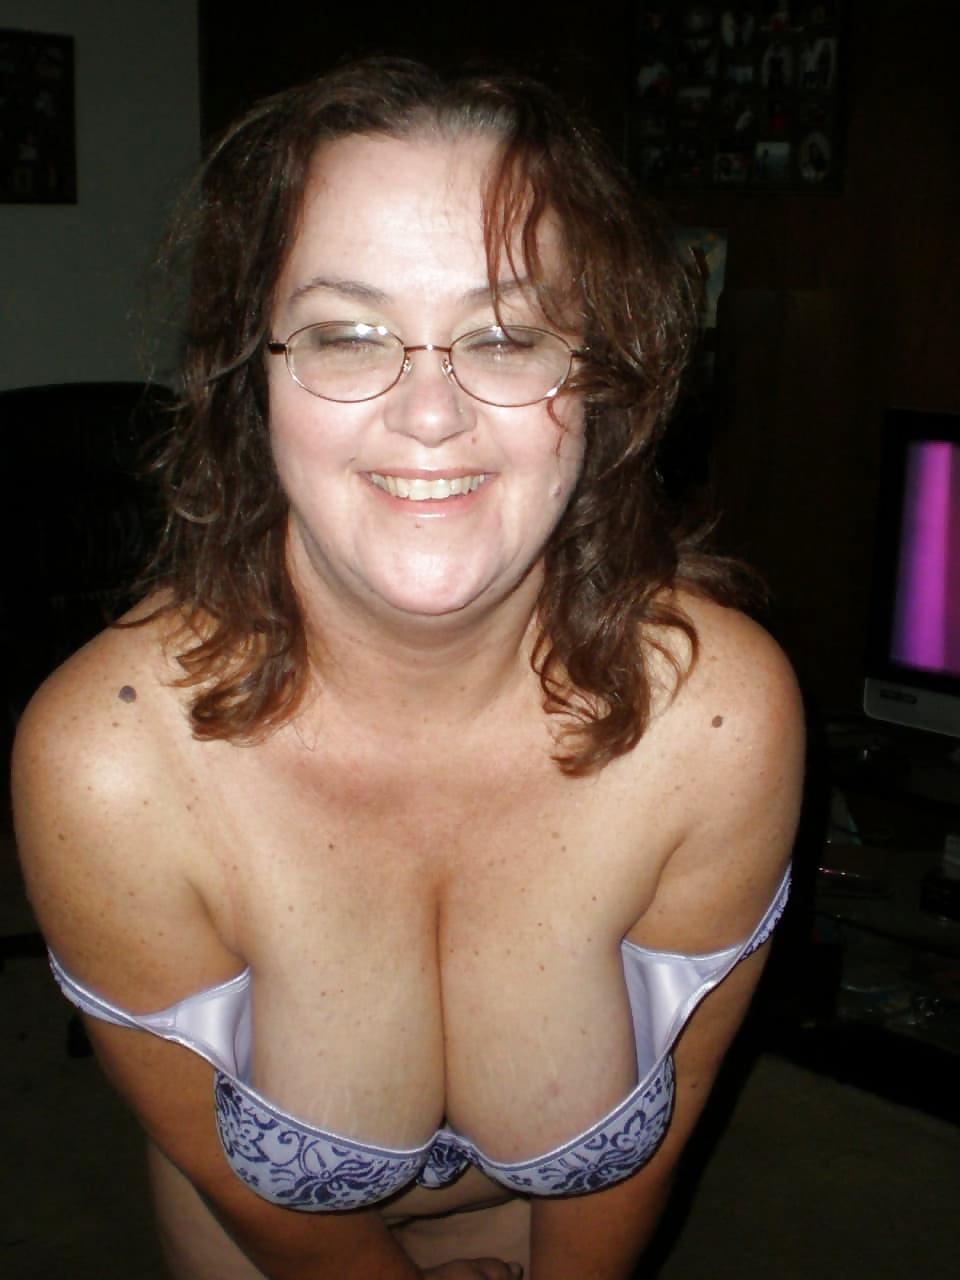 amateur-mom-bra-big-tits-little-dicks